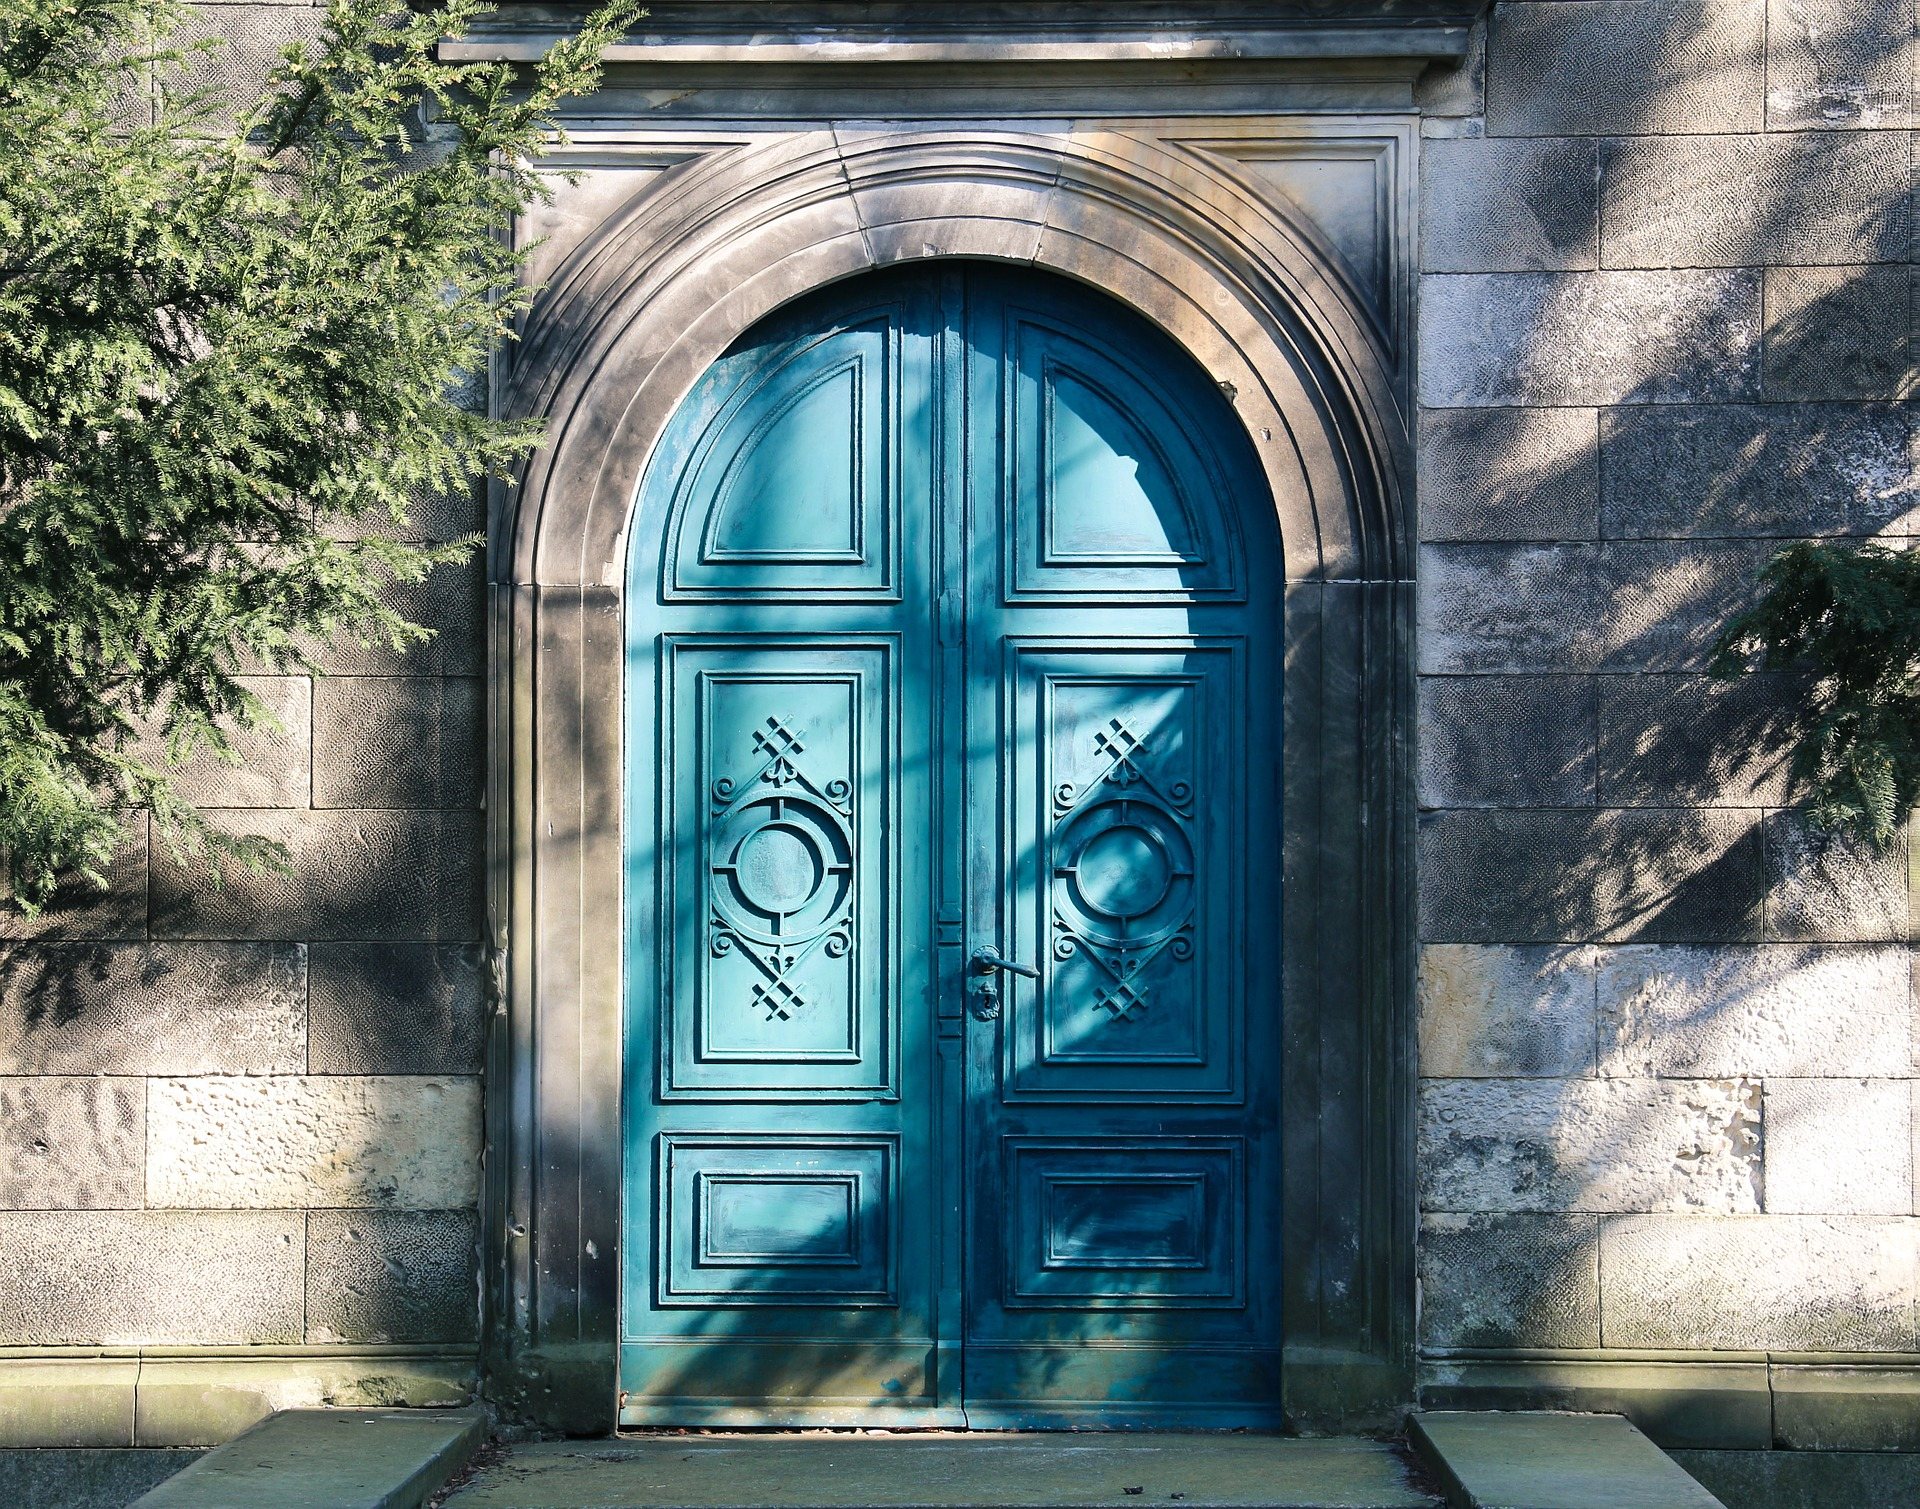 Deus fechou a porta